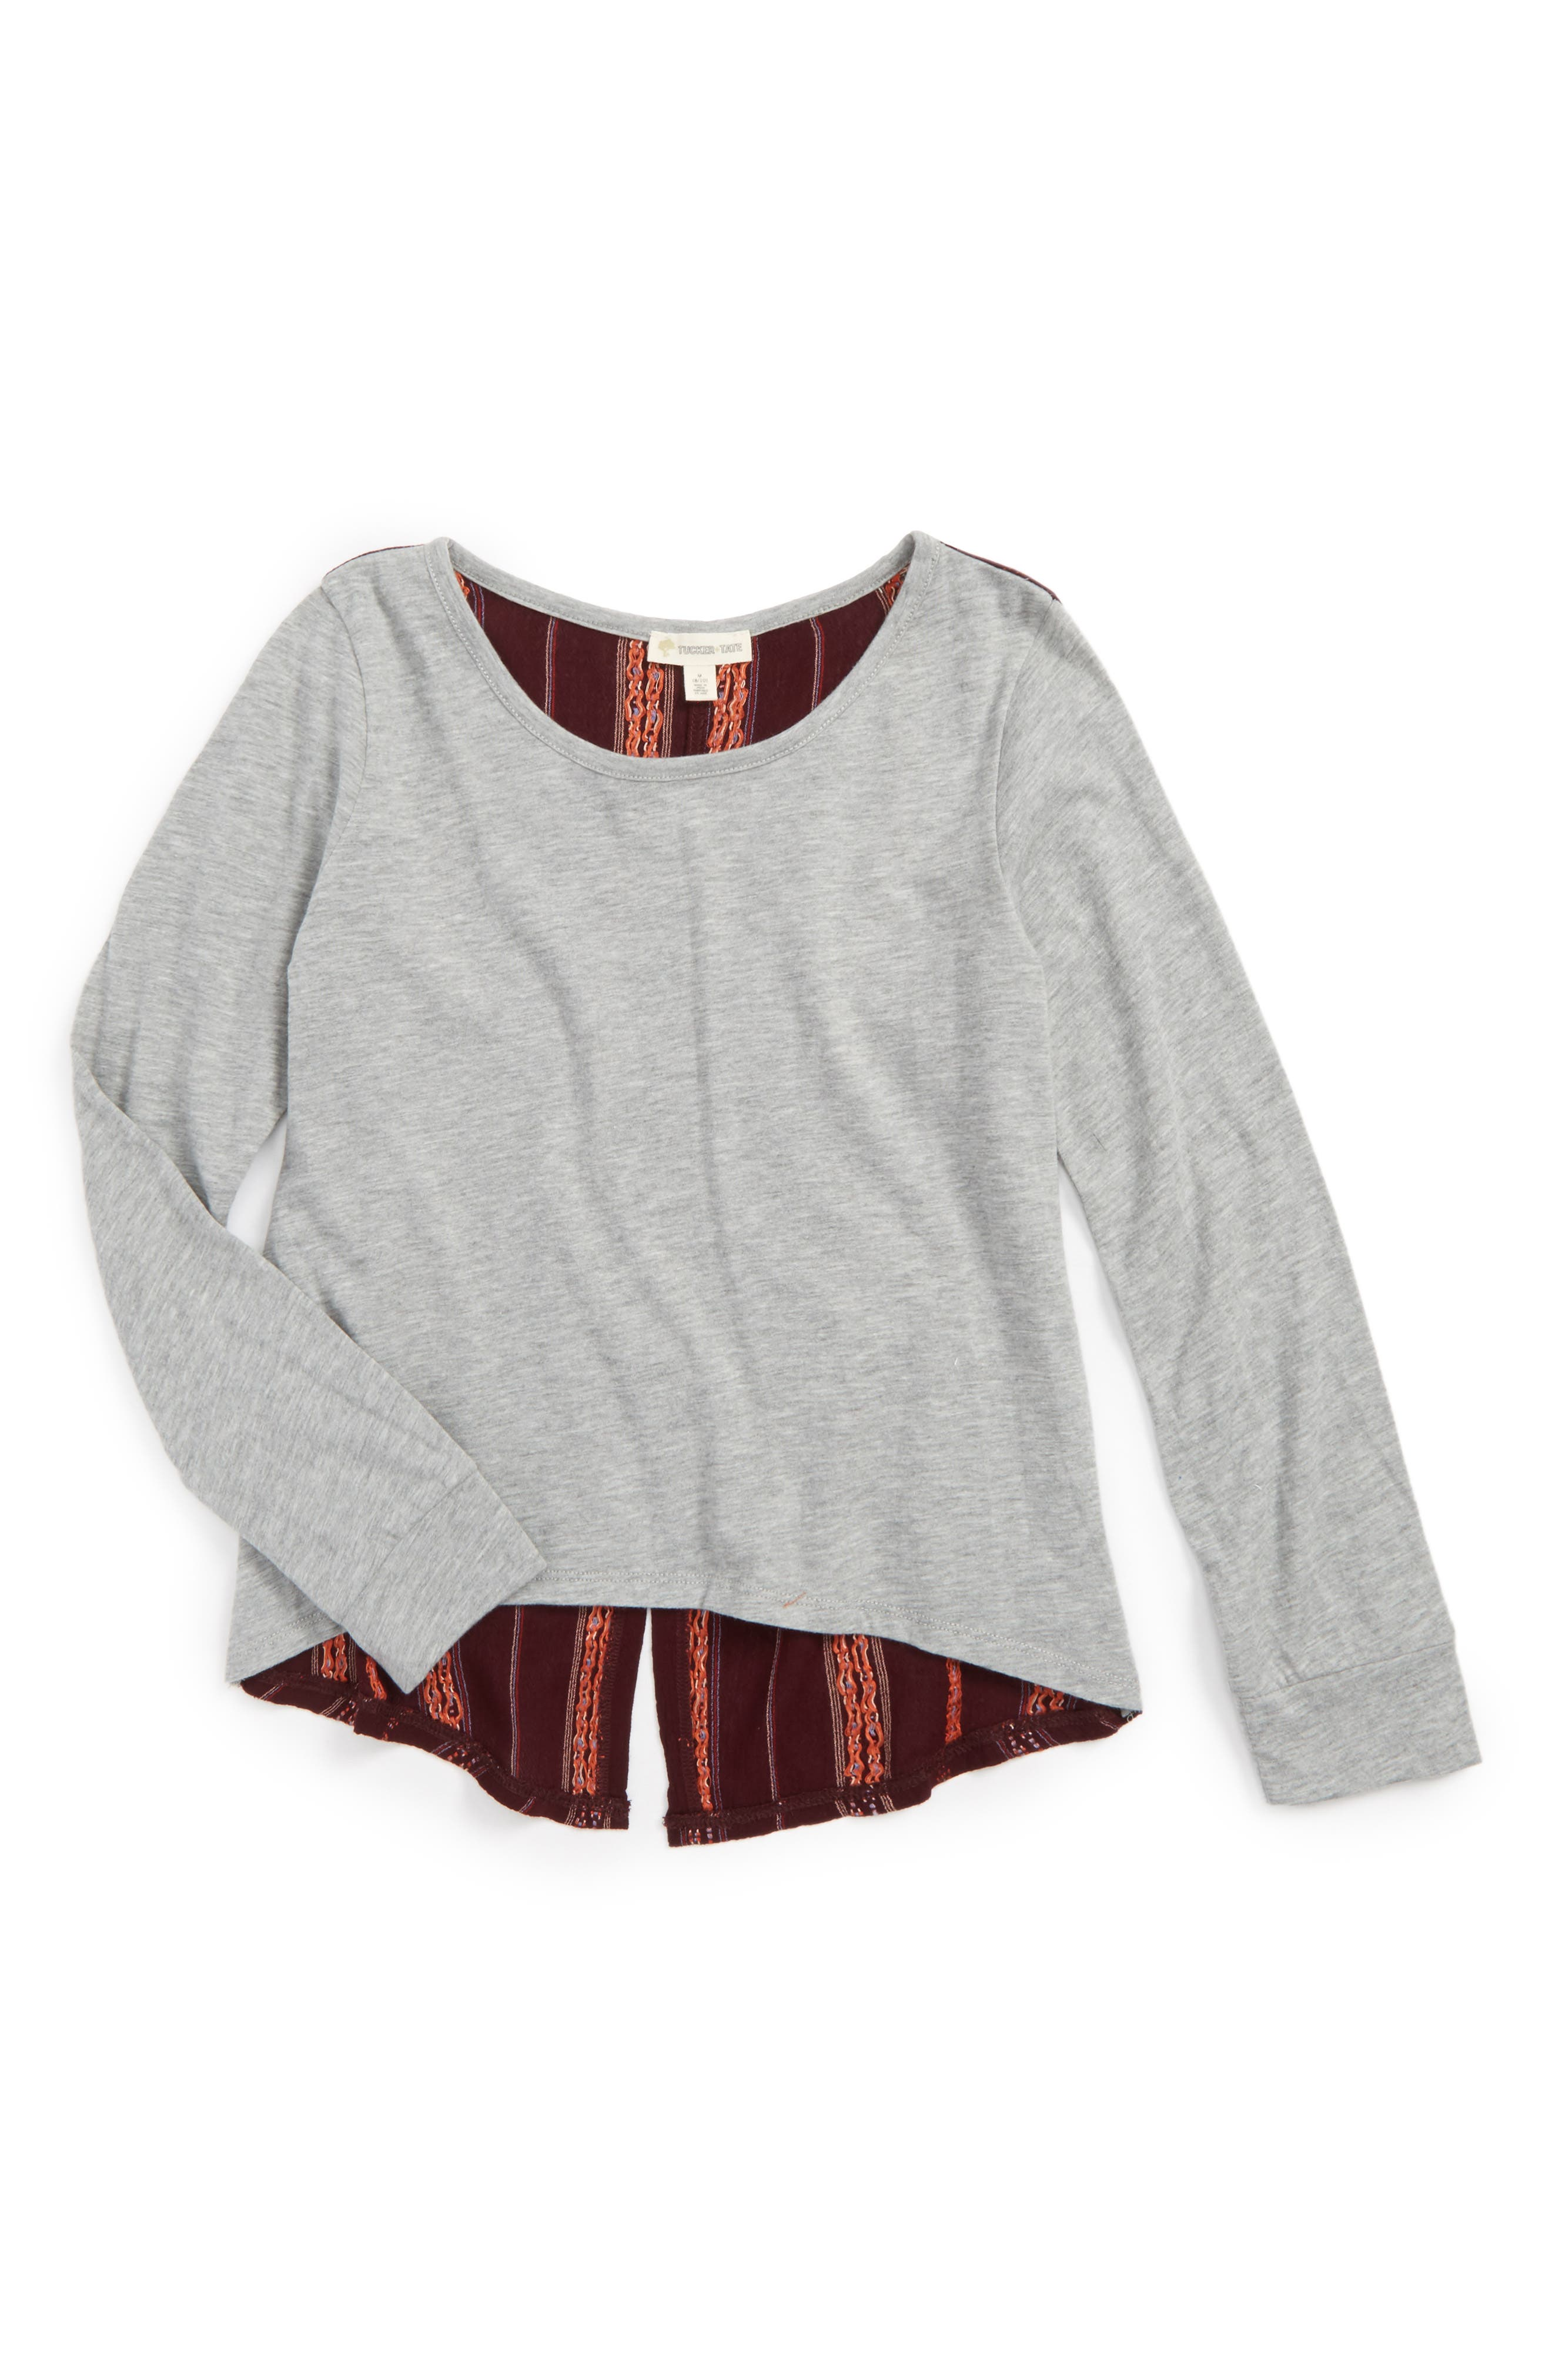 Embroidered Back Shirt,                             Main thumbnail 1, color,                             030